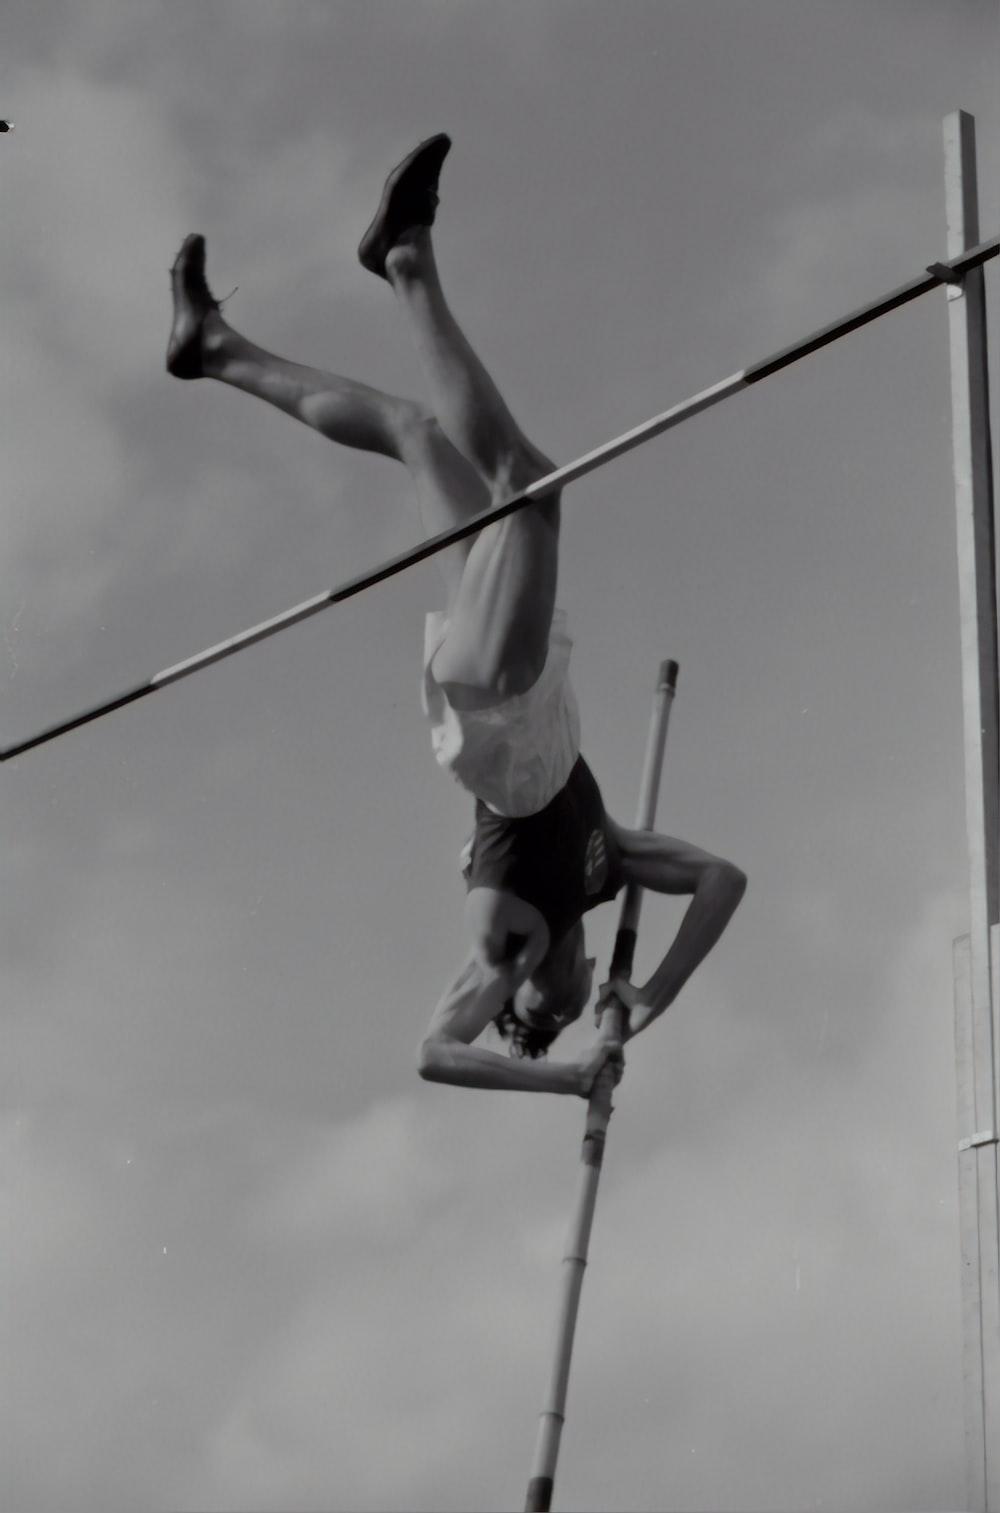 man holding pole stick